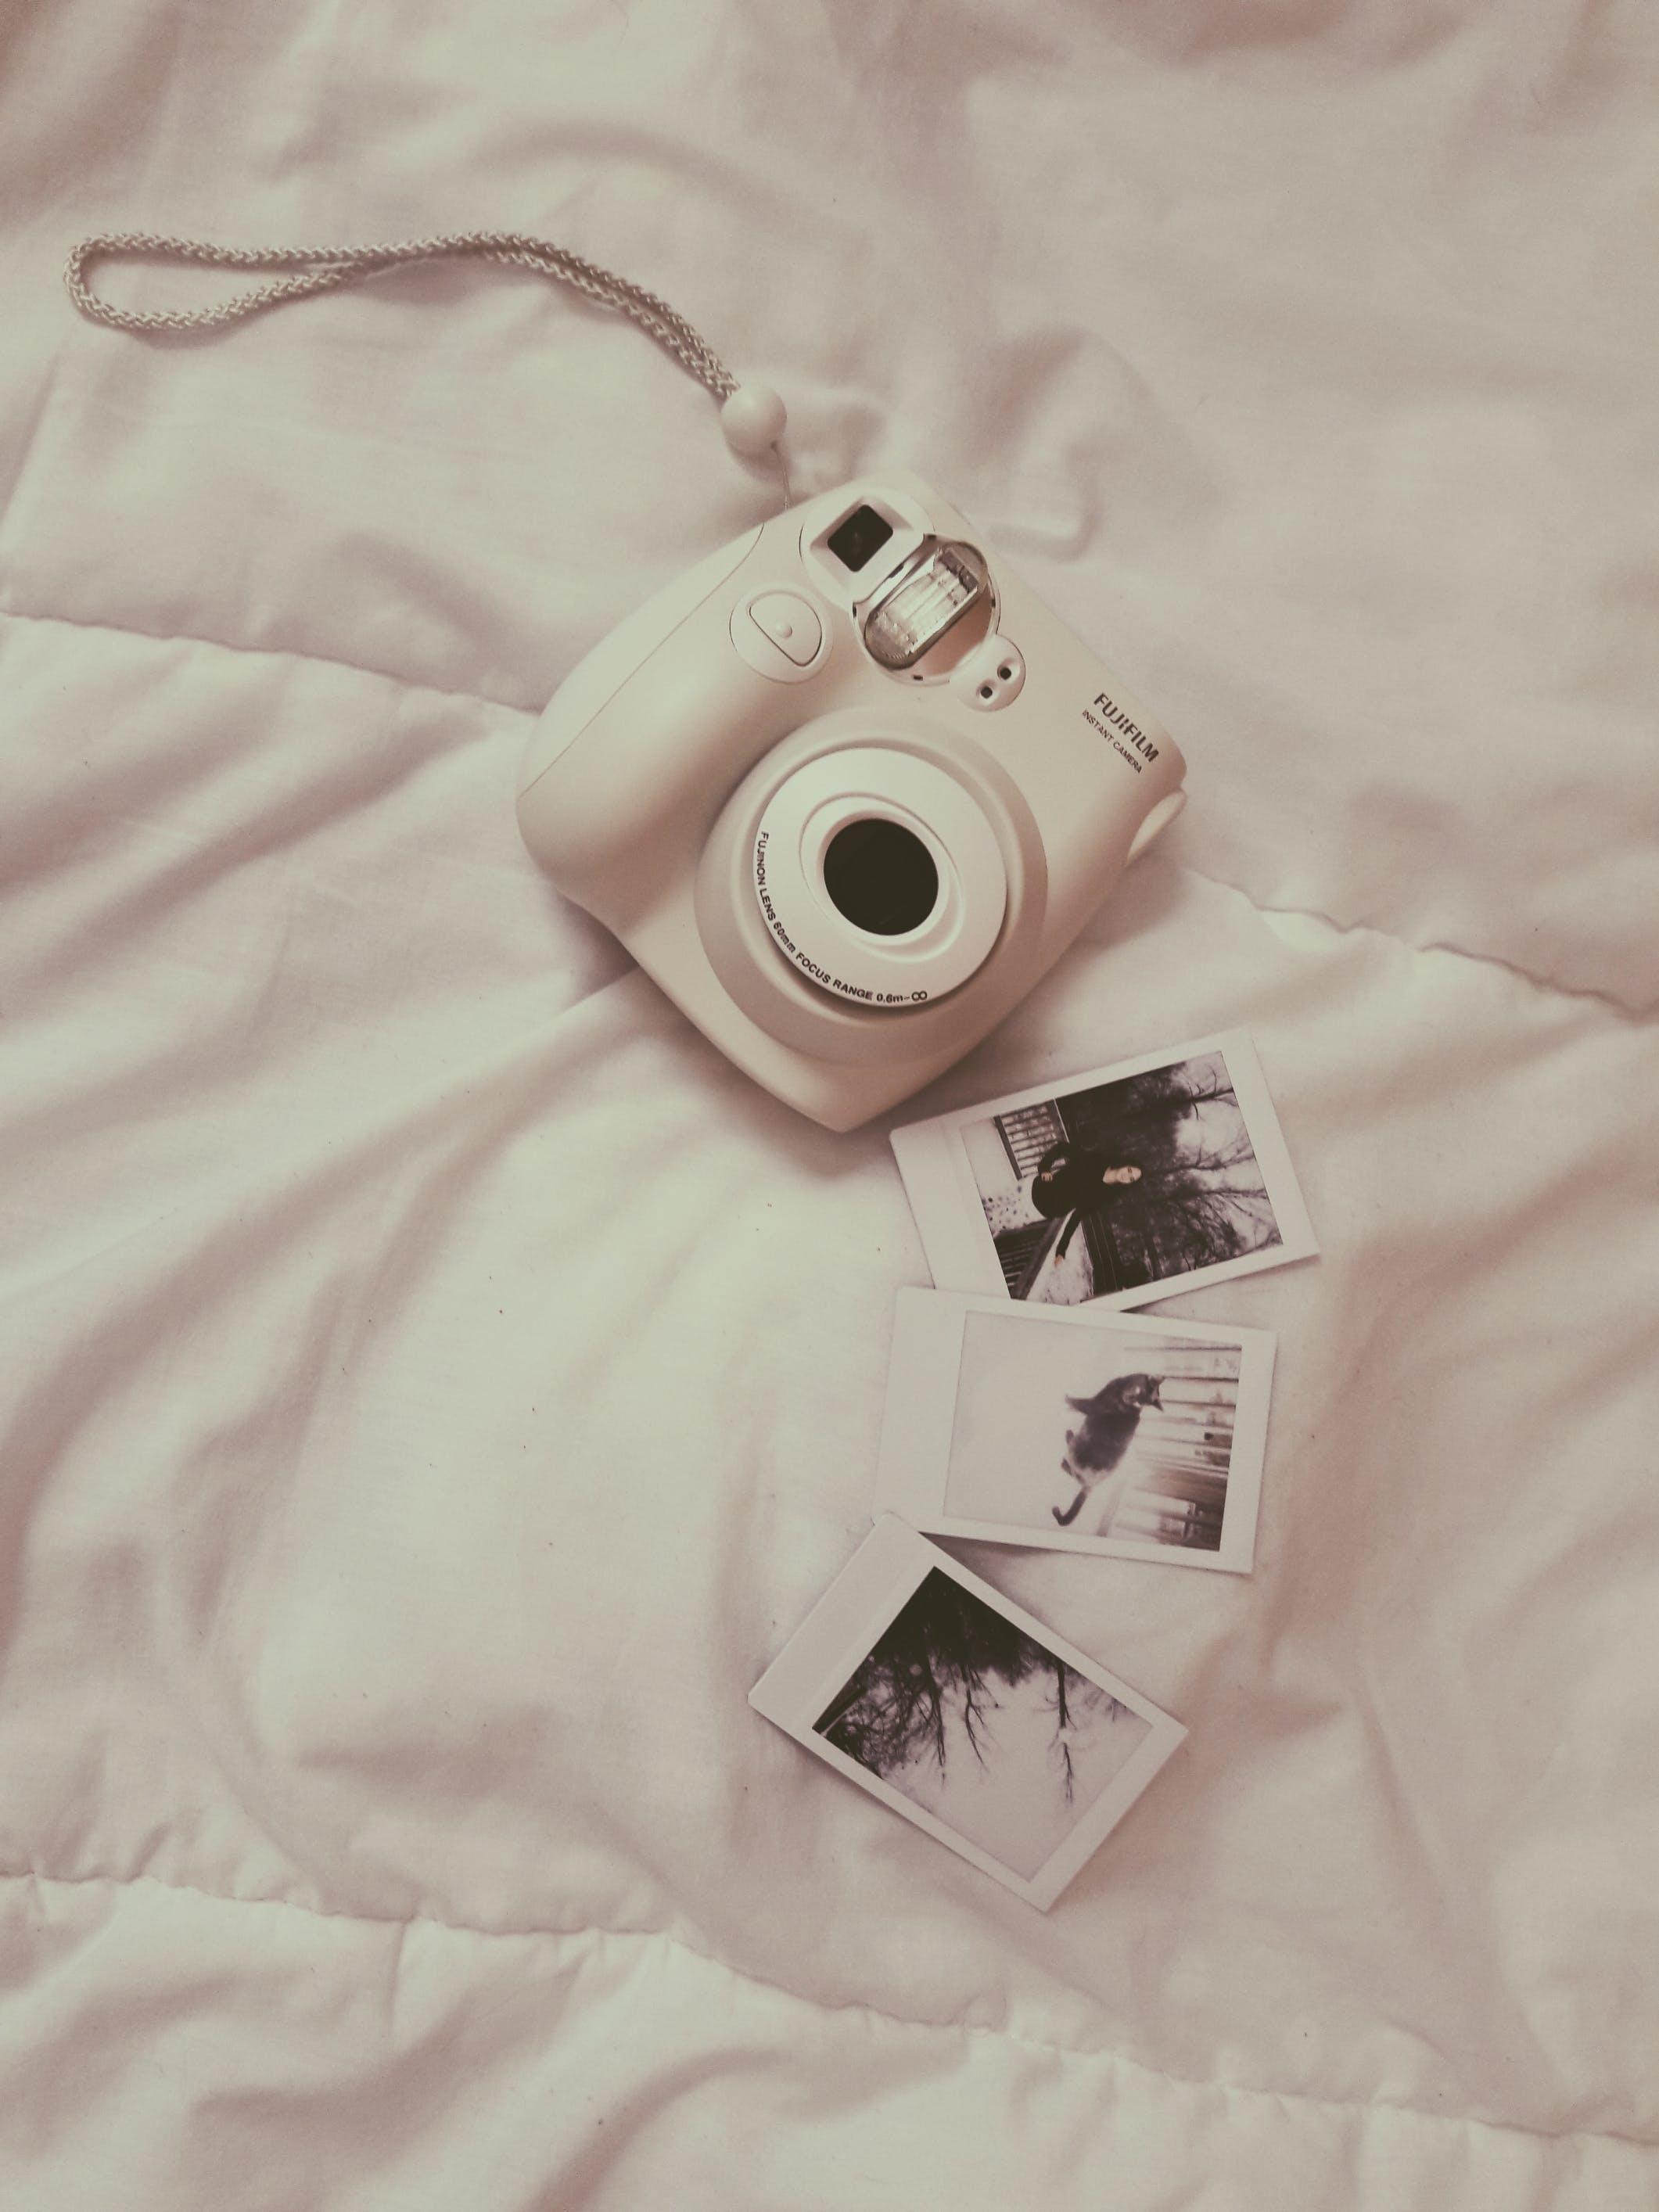 Photo of White Fujifilm Instax Camera